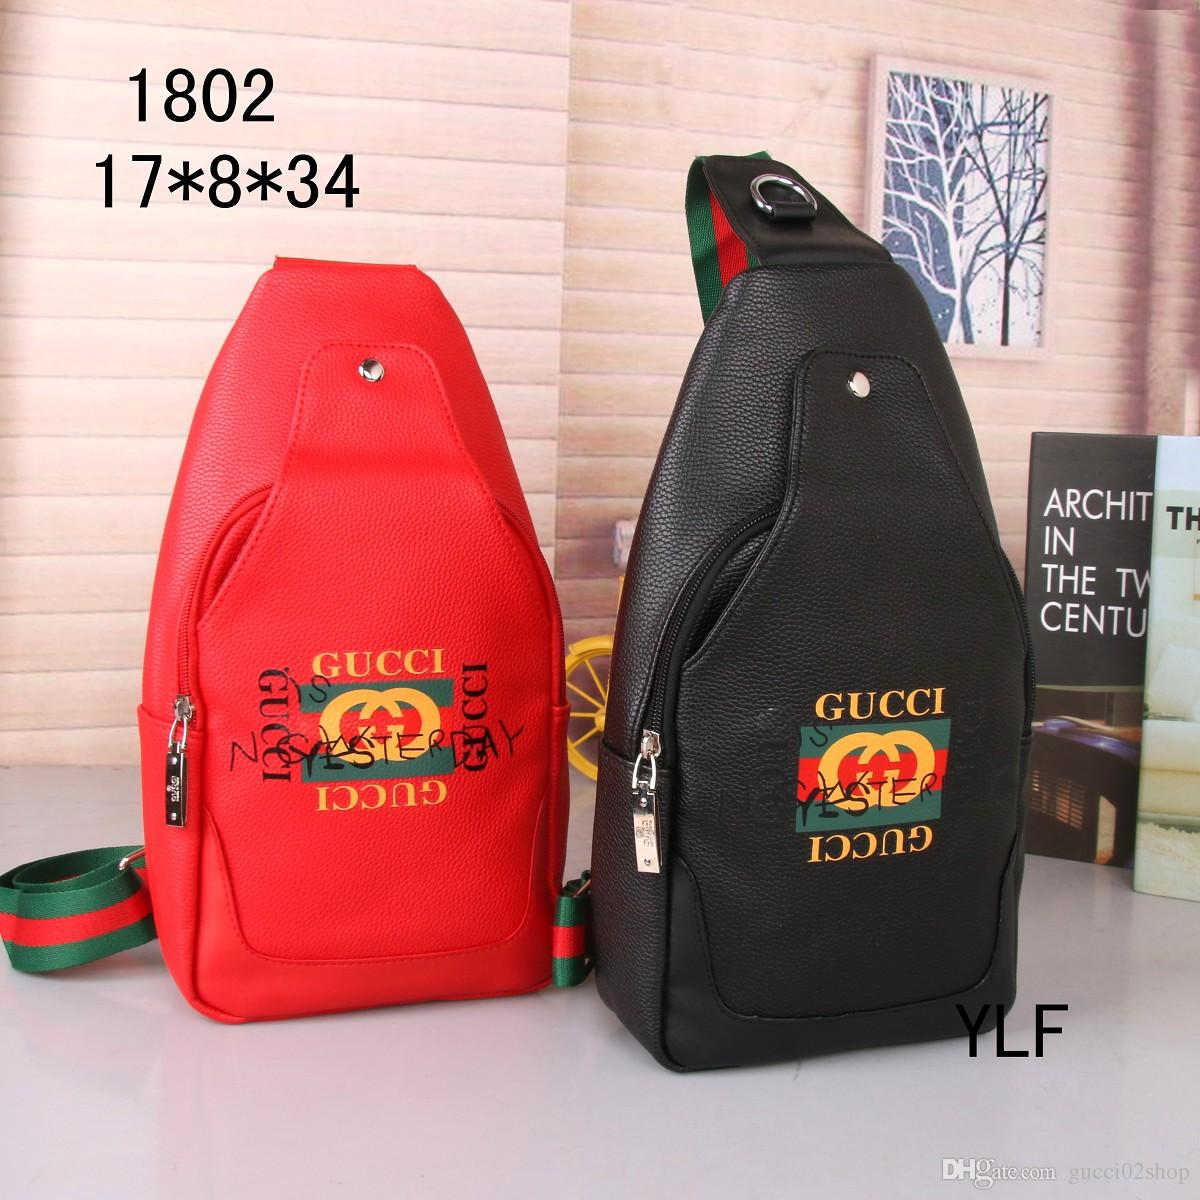 86ca24e44e7 New fashionable high-quality lady bag jet suit for traveling men Pu single  shoulder bag inclined bag #1802